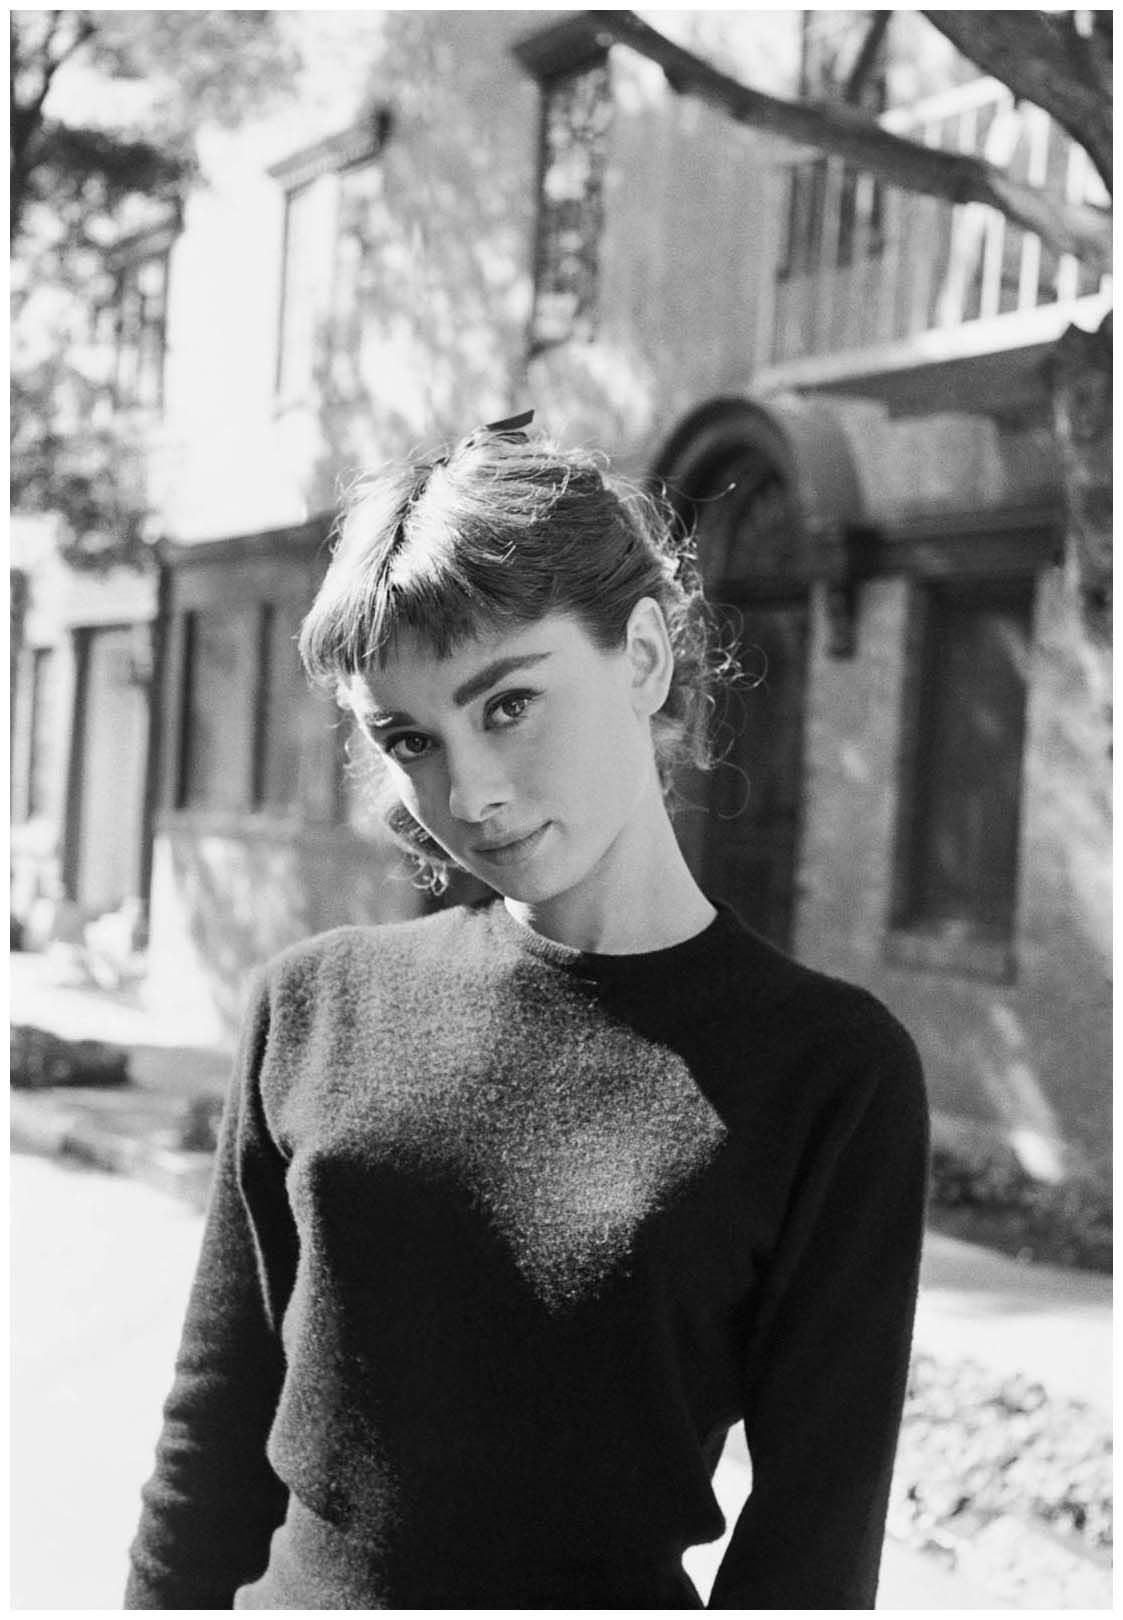 photo-mark-shaw-portrait-of-audrey-hepburn-los-angeles-1953.jpg (1123×1620)